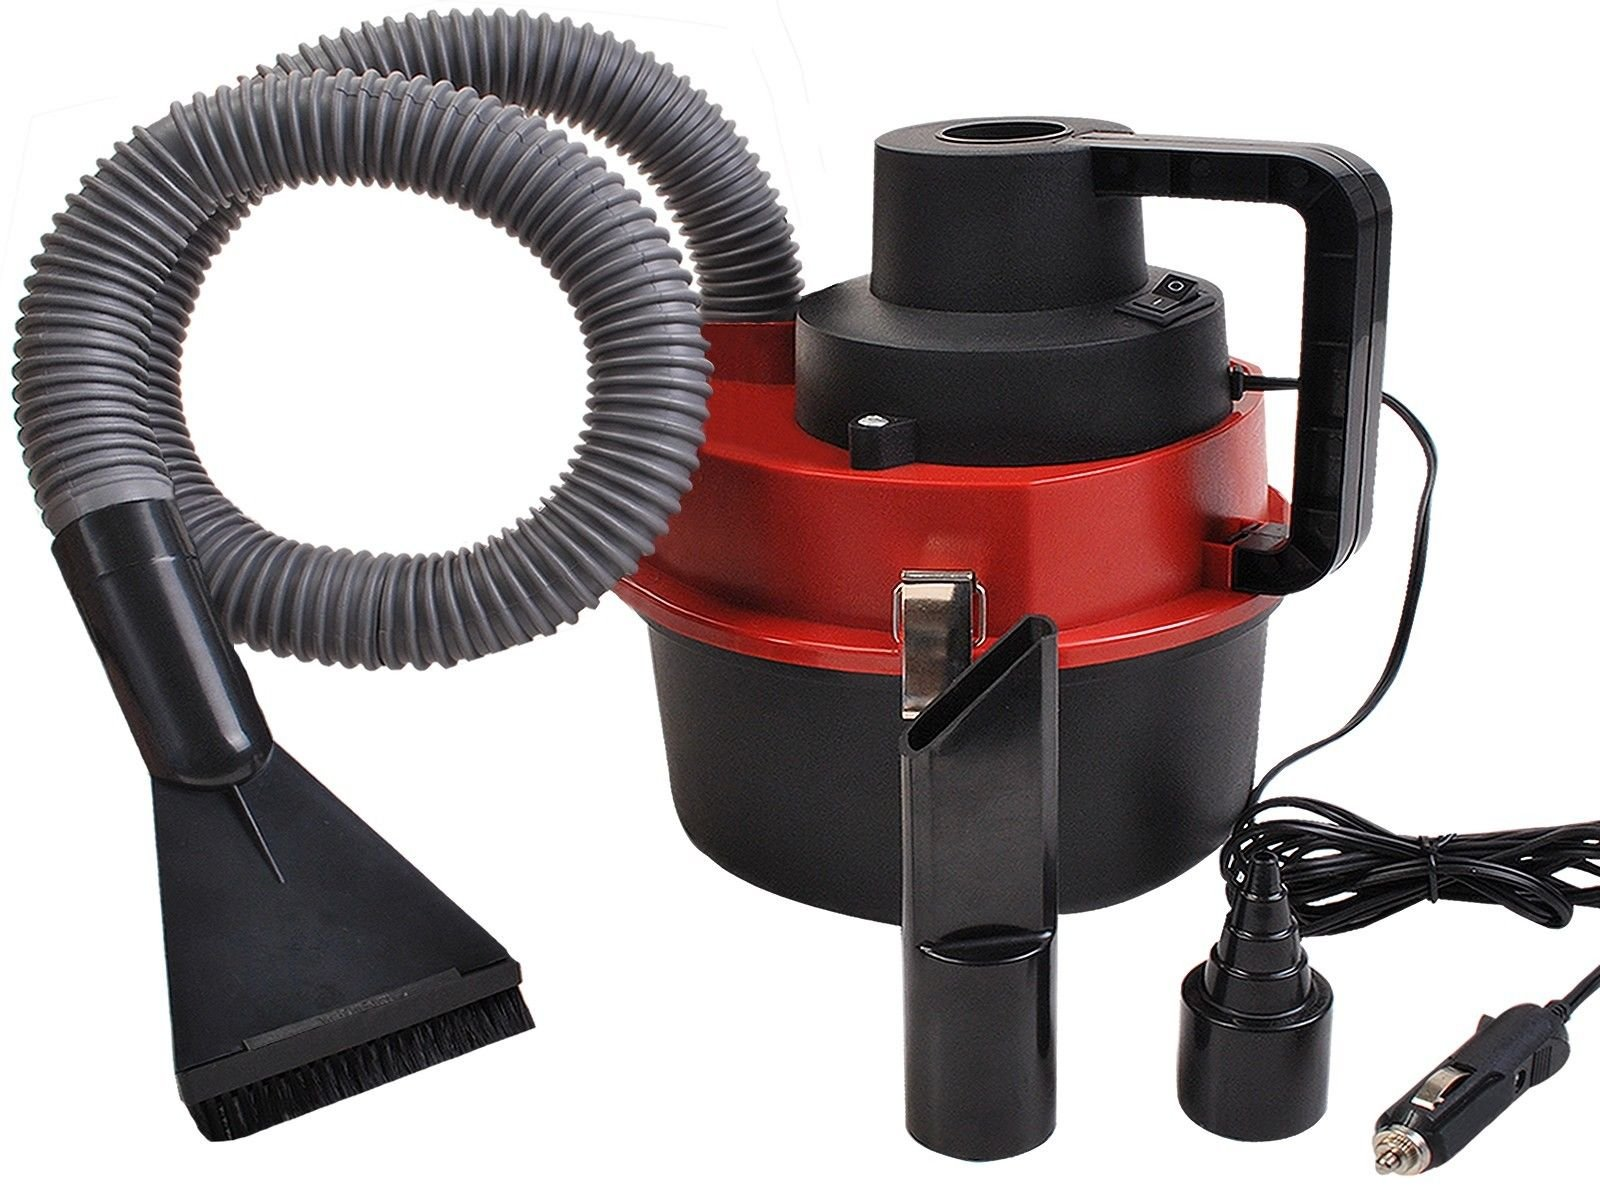 Auto Car Vacuum Cleaner Portable Wet Dry Dc 12 Volt Mini Portable High Power